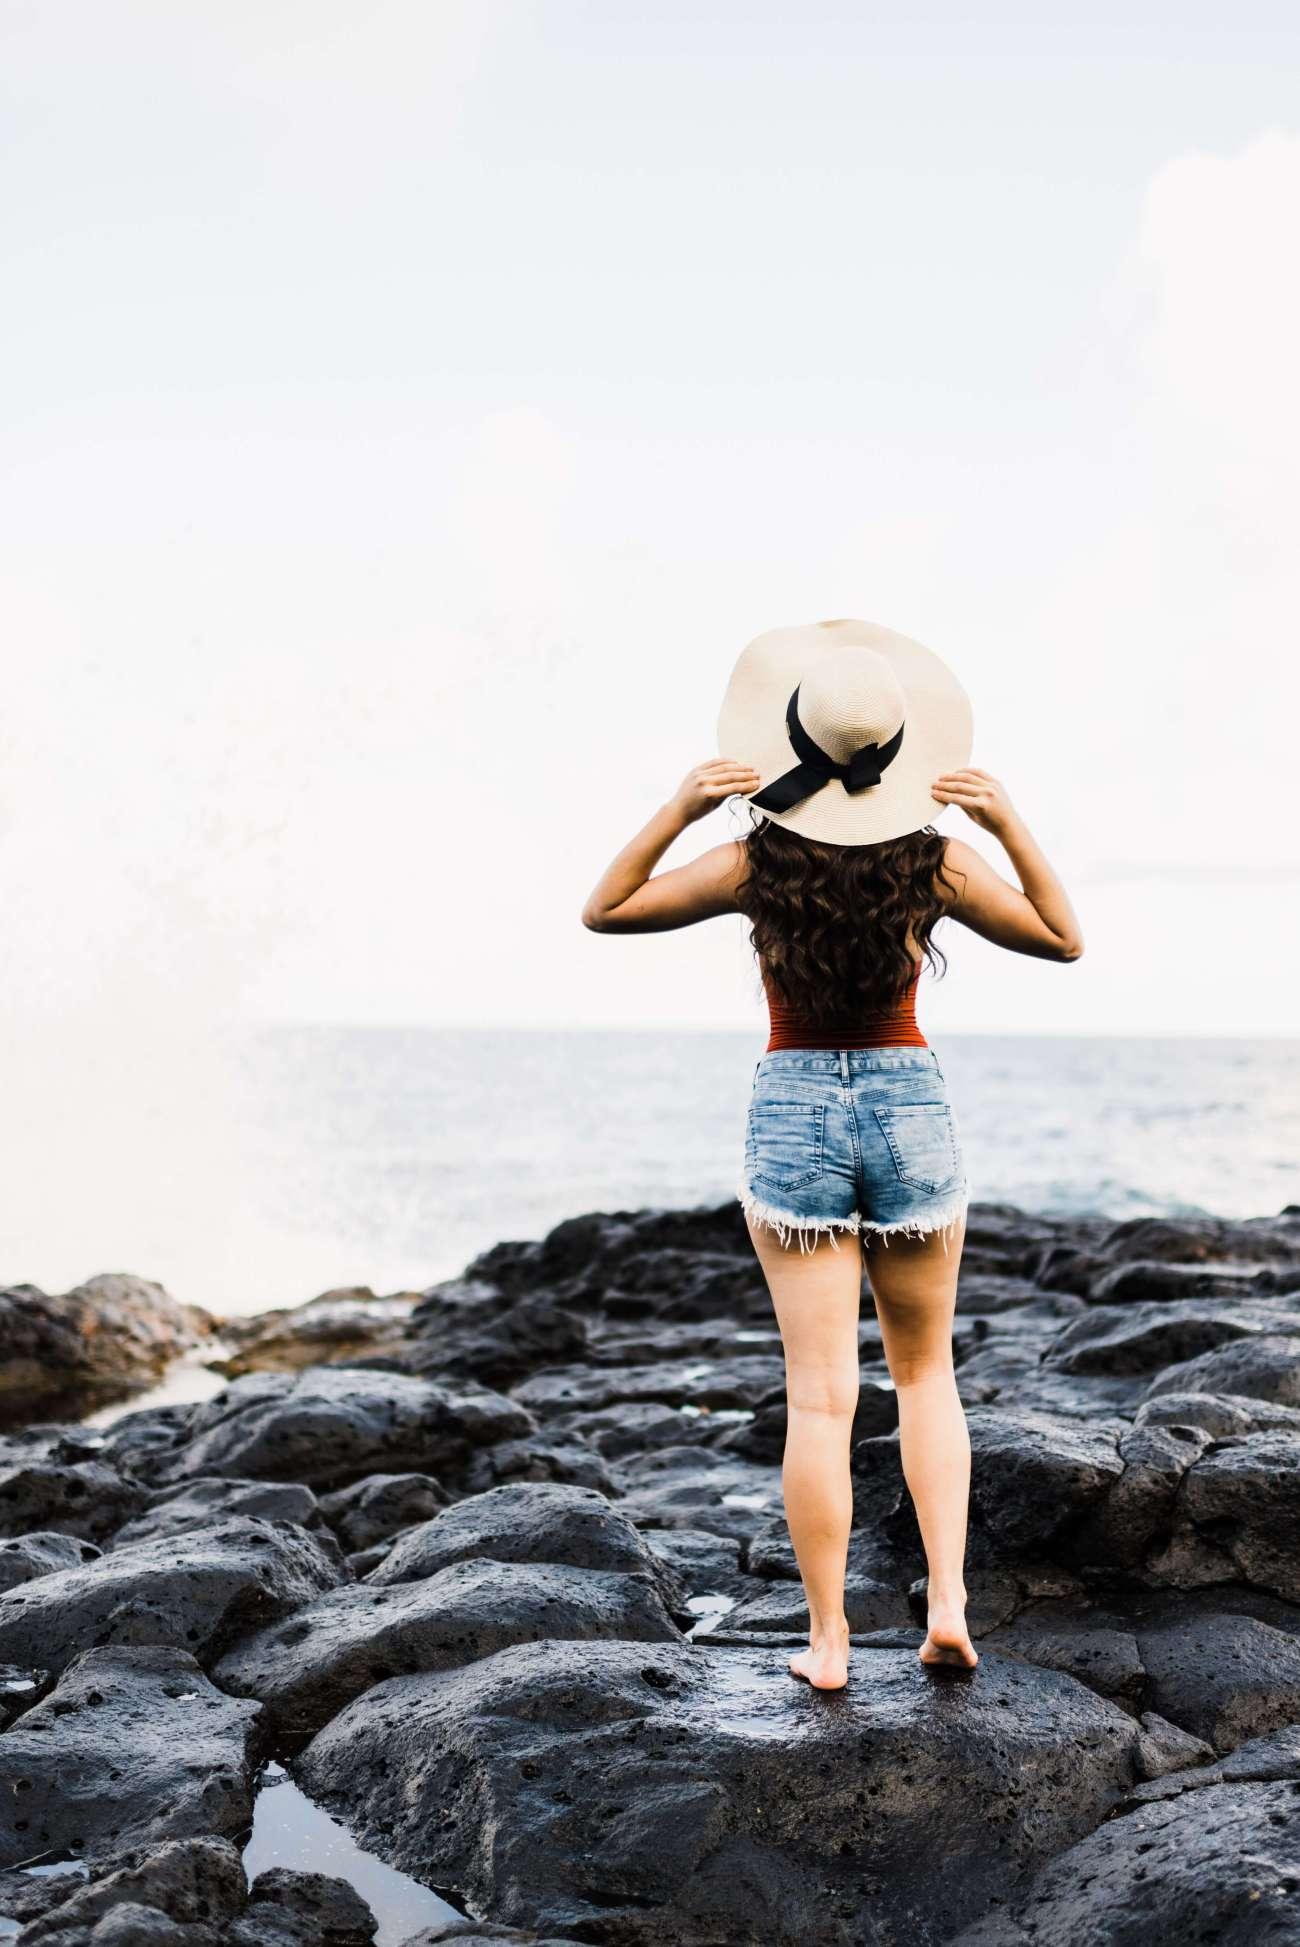 Kauai,destination seniors,elope,elopement photographer,lithified cliffs,senior photos,yearbook photos. s photography,